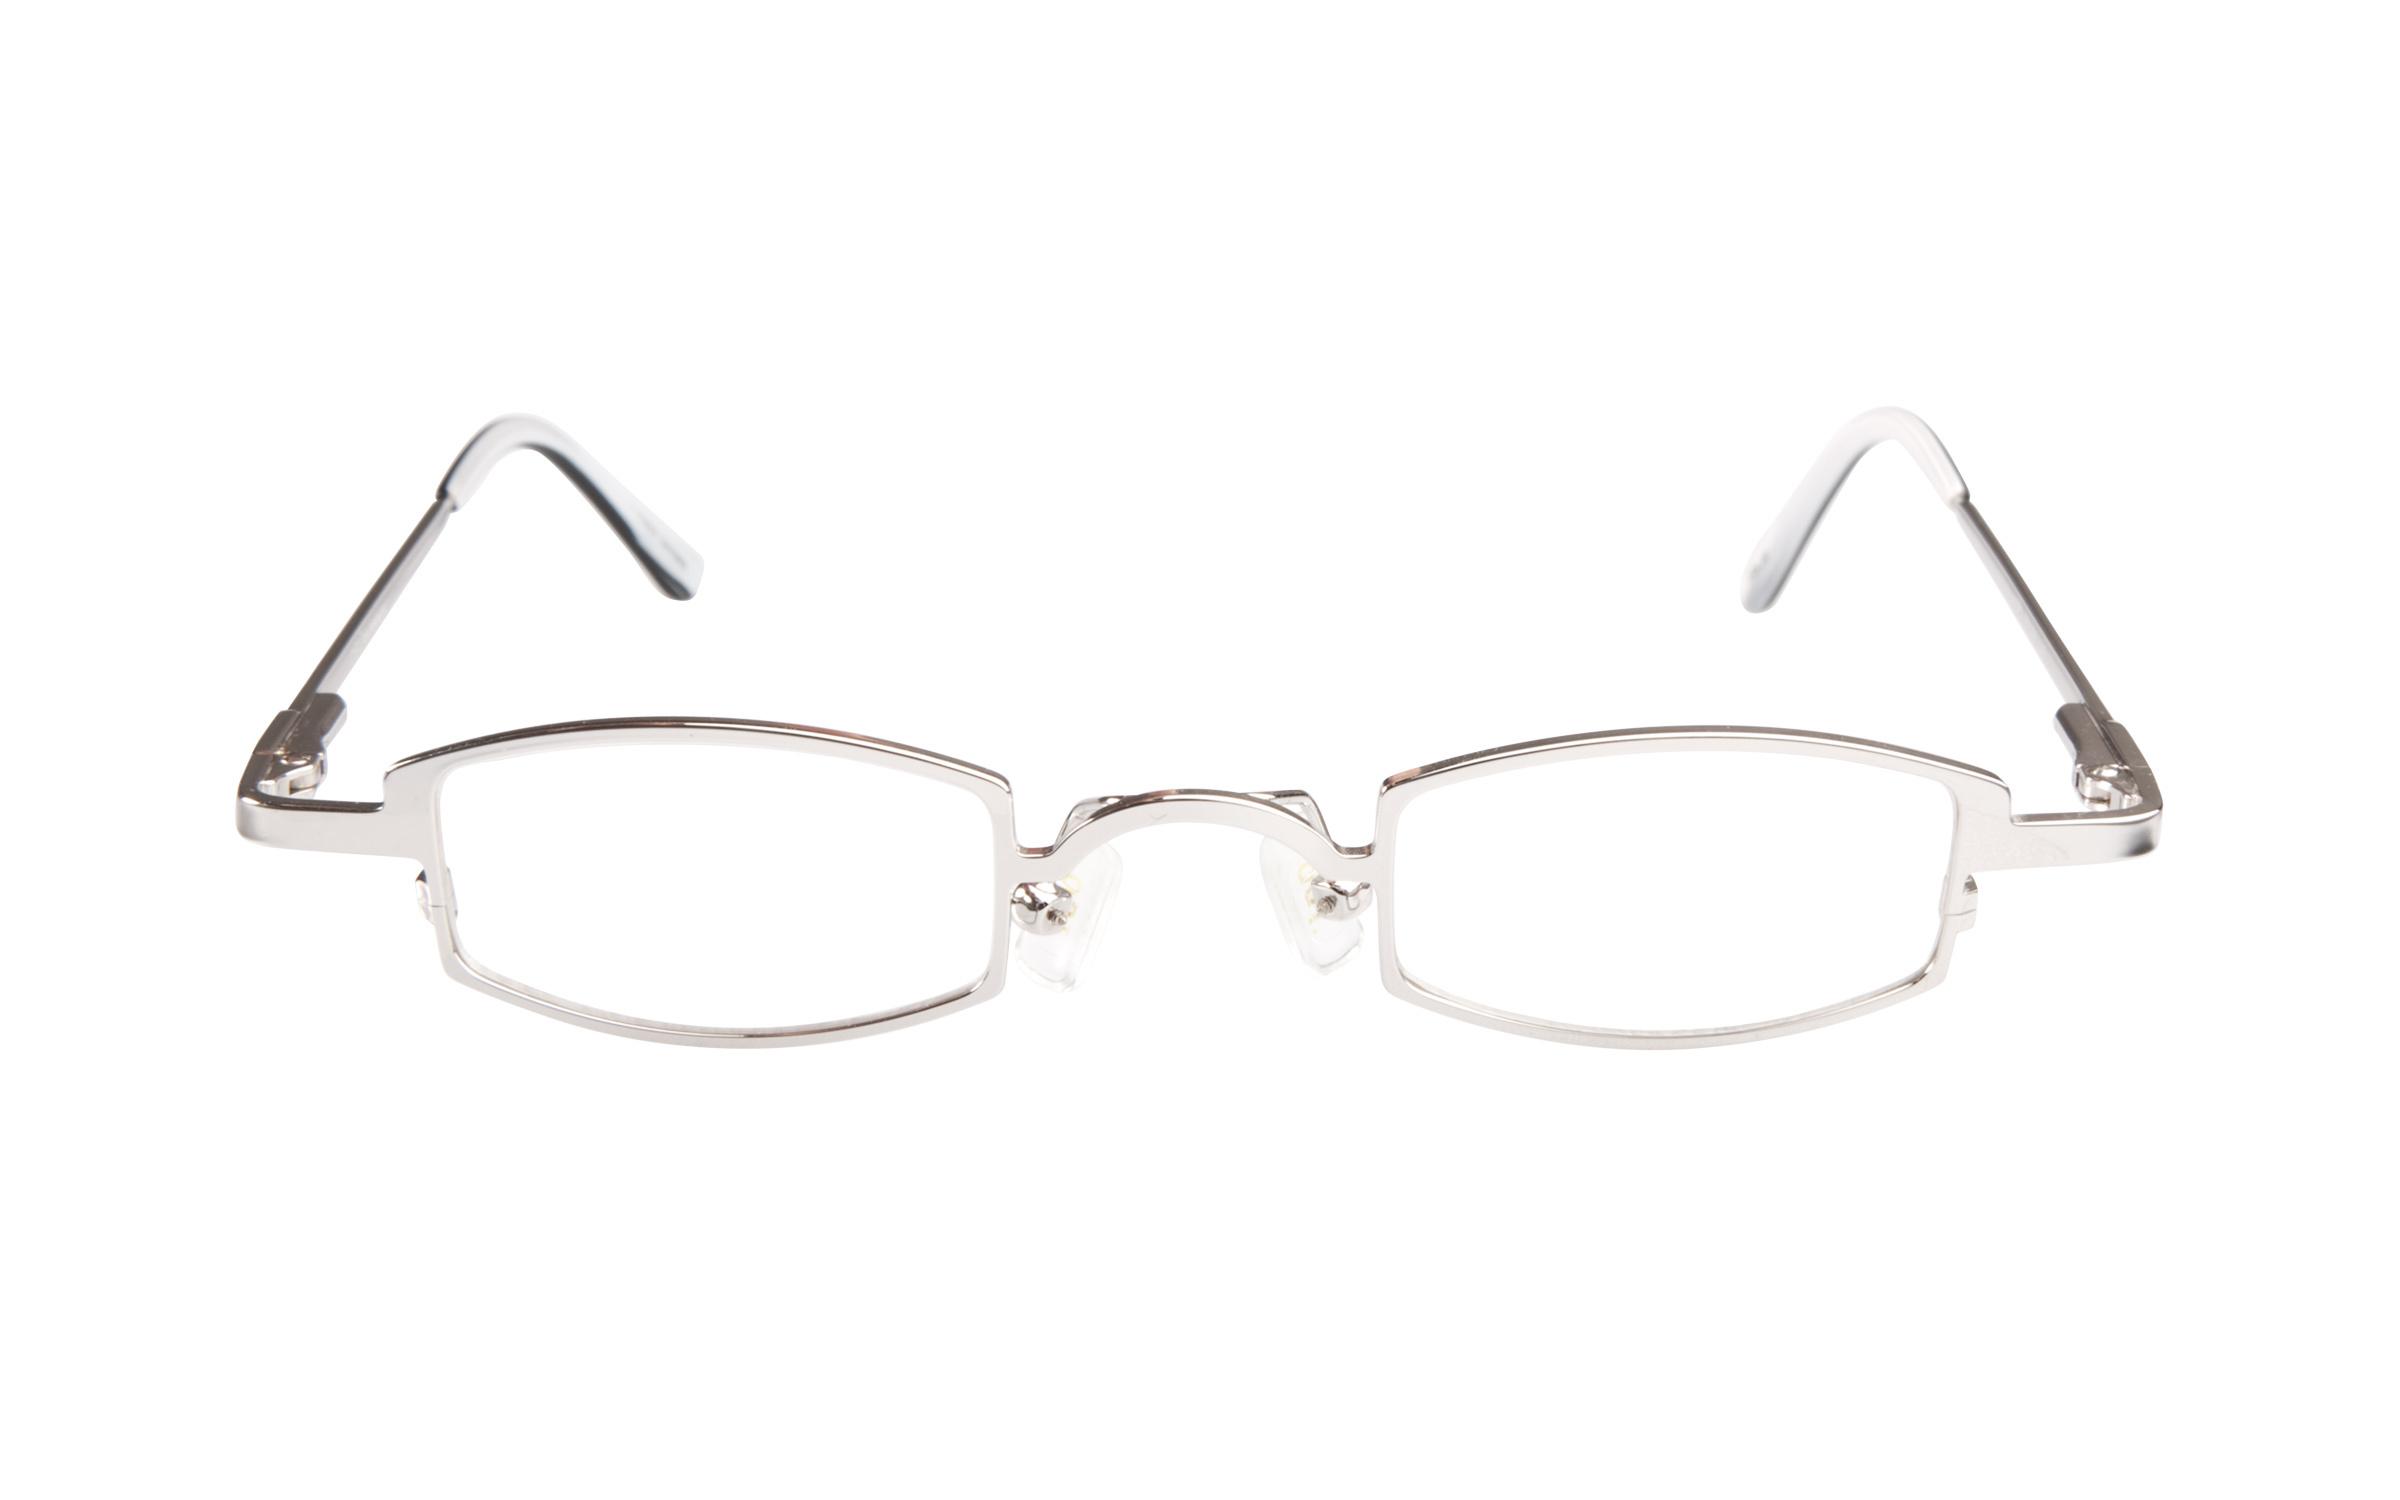 OGI_Classic_1005_22_Eyeglasses_and_Frame_in_Silver_|_Metal__Online_Coastal